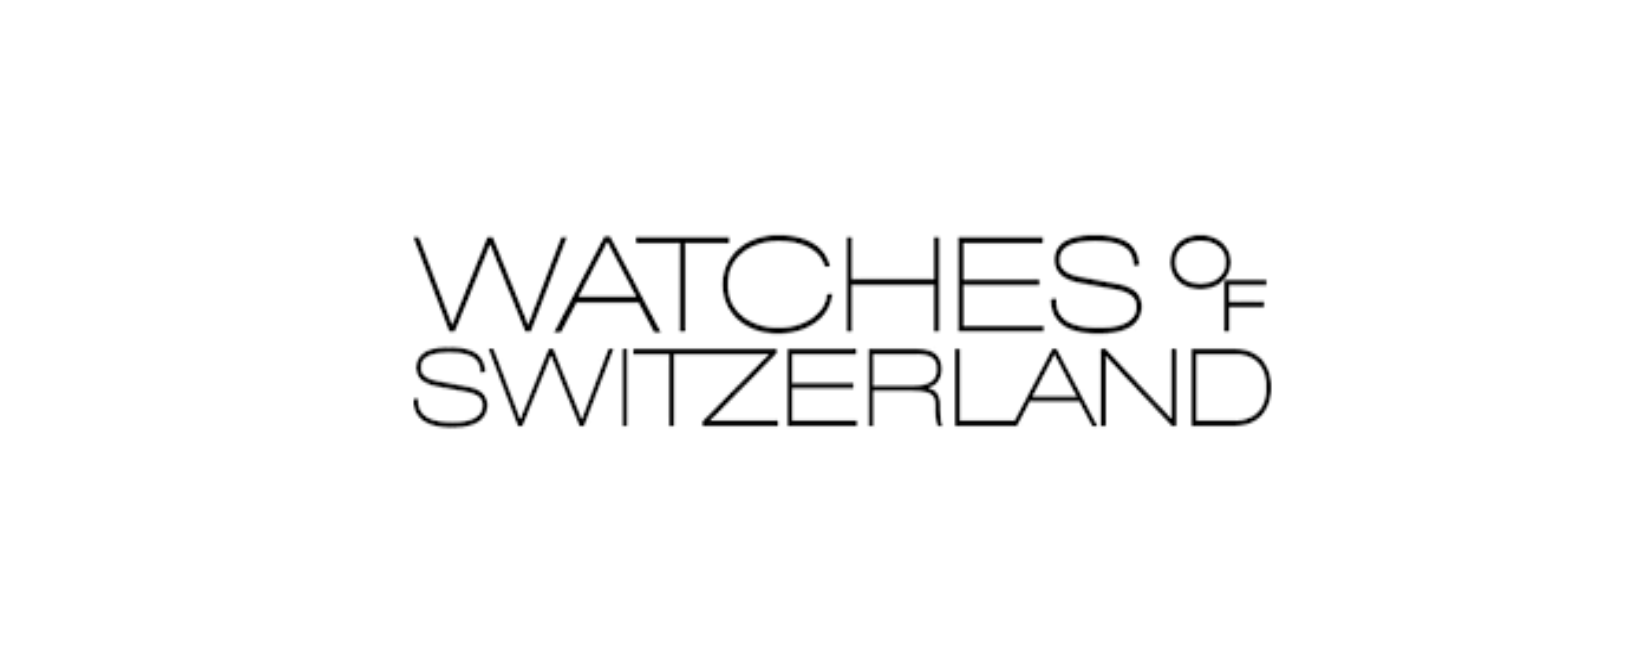 Watches Of Switzerland Discount Code 2021